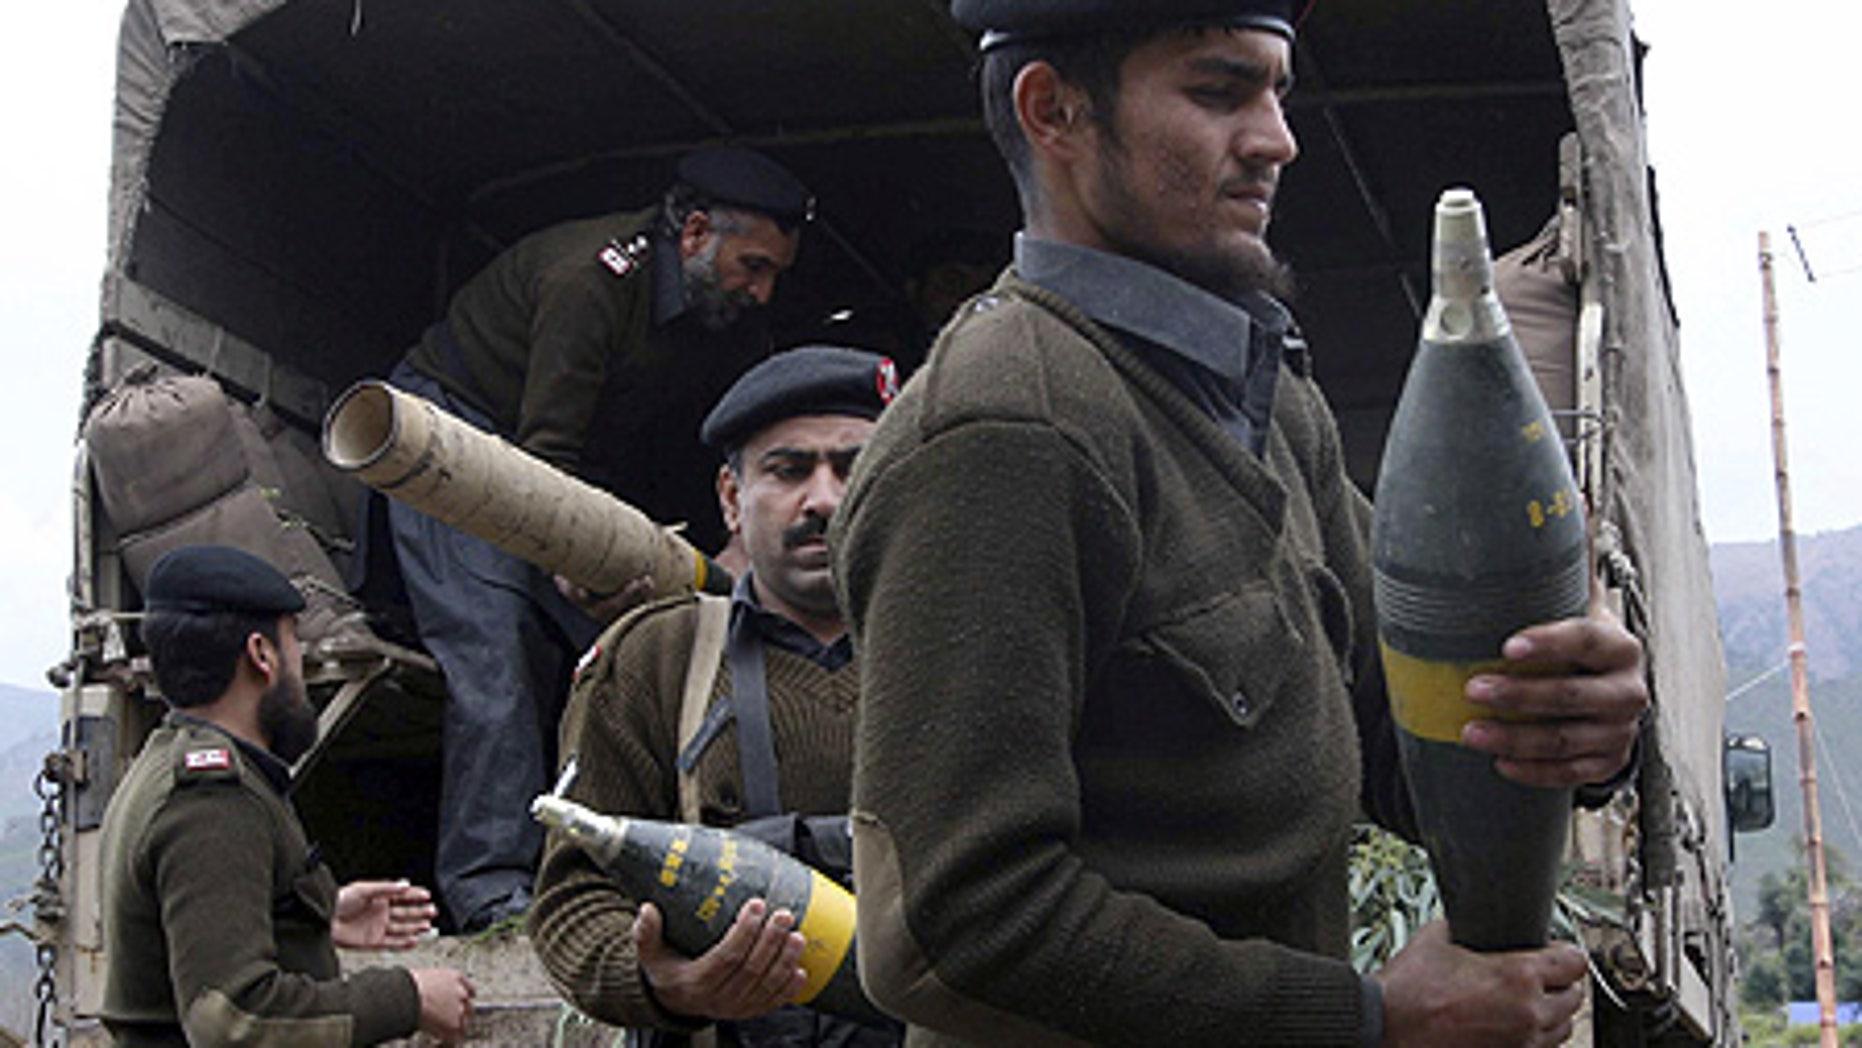 Mar. 3: Pakistan's paramilitary force carry ammunition confiscated from Taliban militants in Dara Adam Khel near Peshawar, Pakistan.